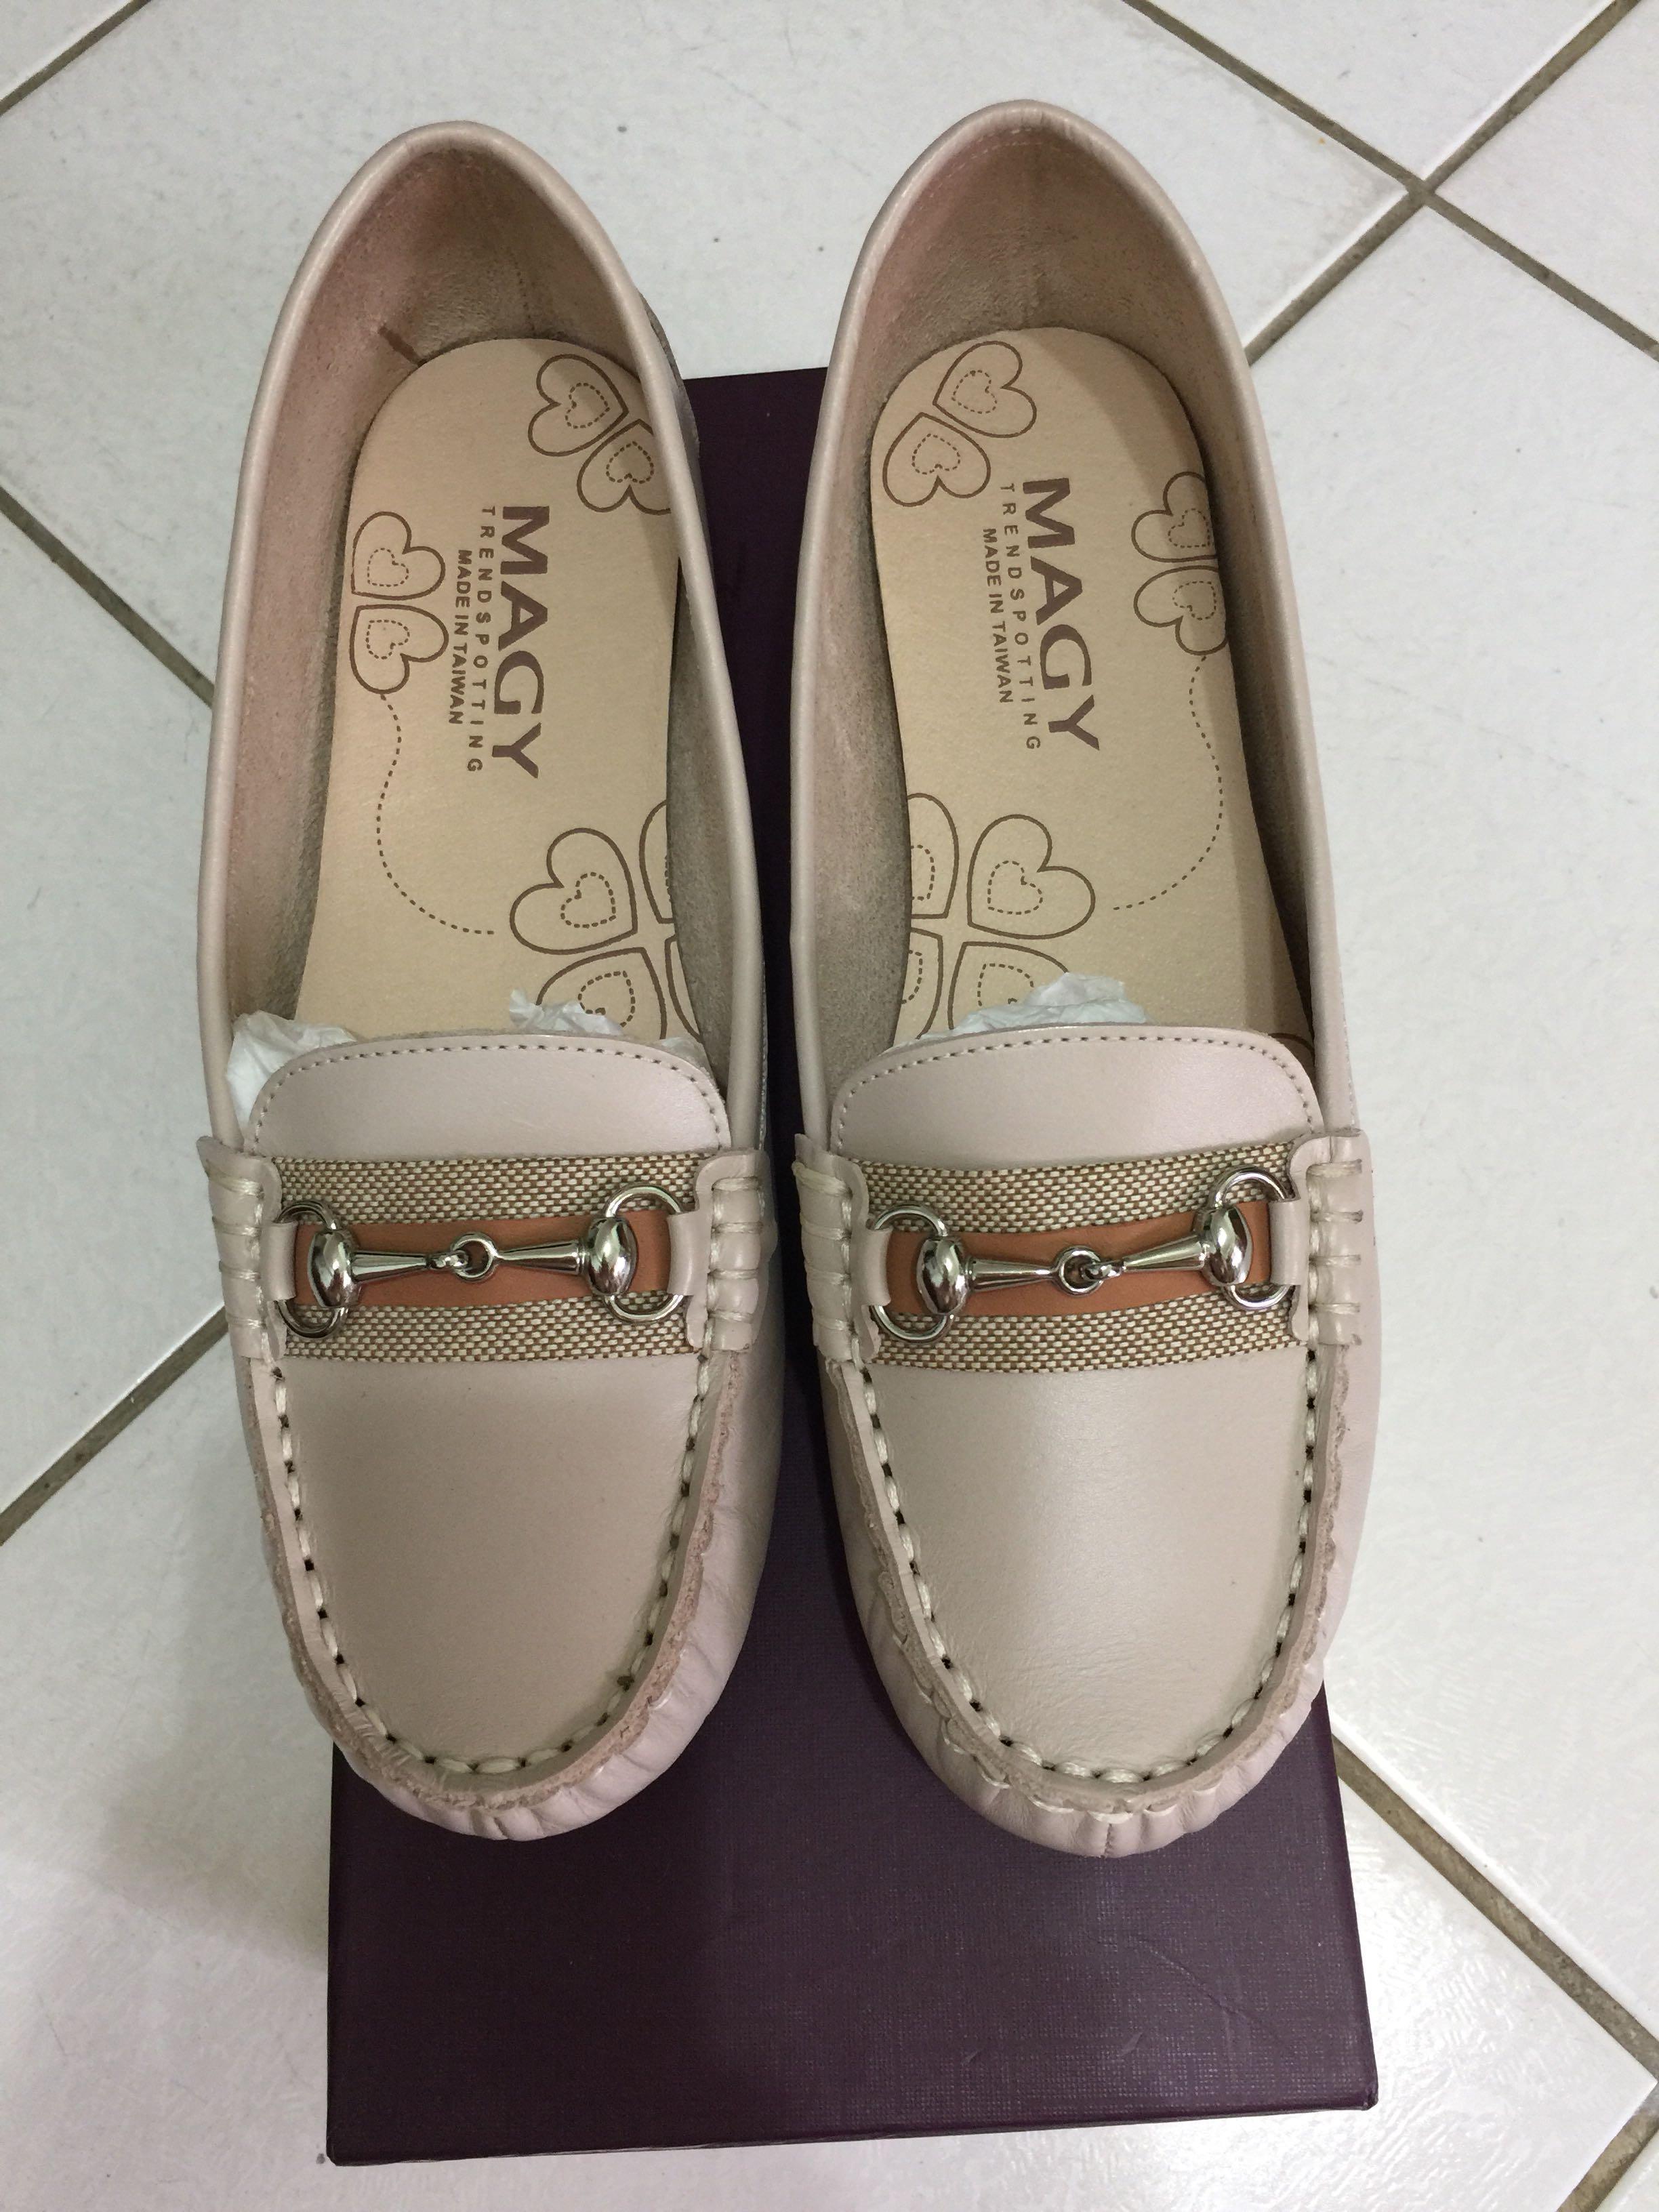 MAGY瑪格麗特 真皮樂福鞋(9成新)